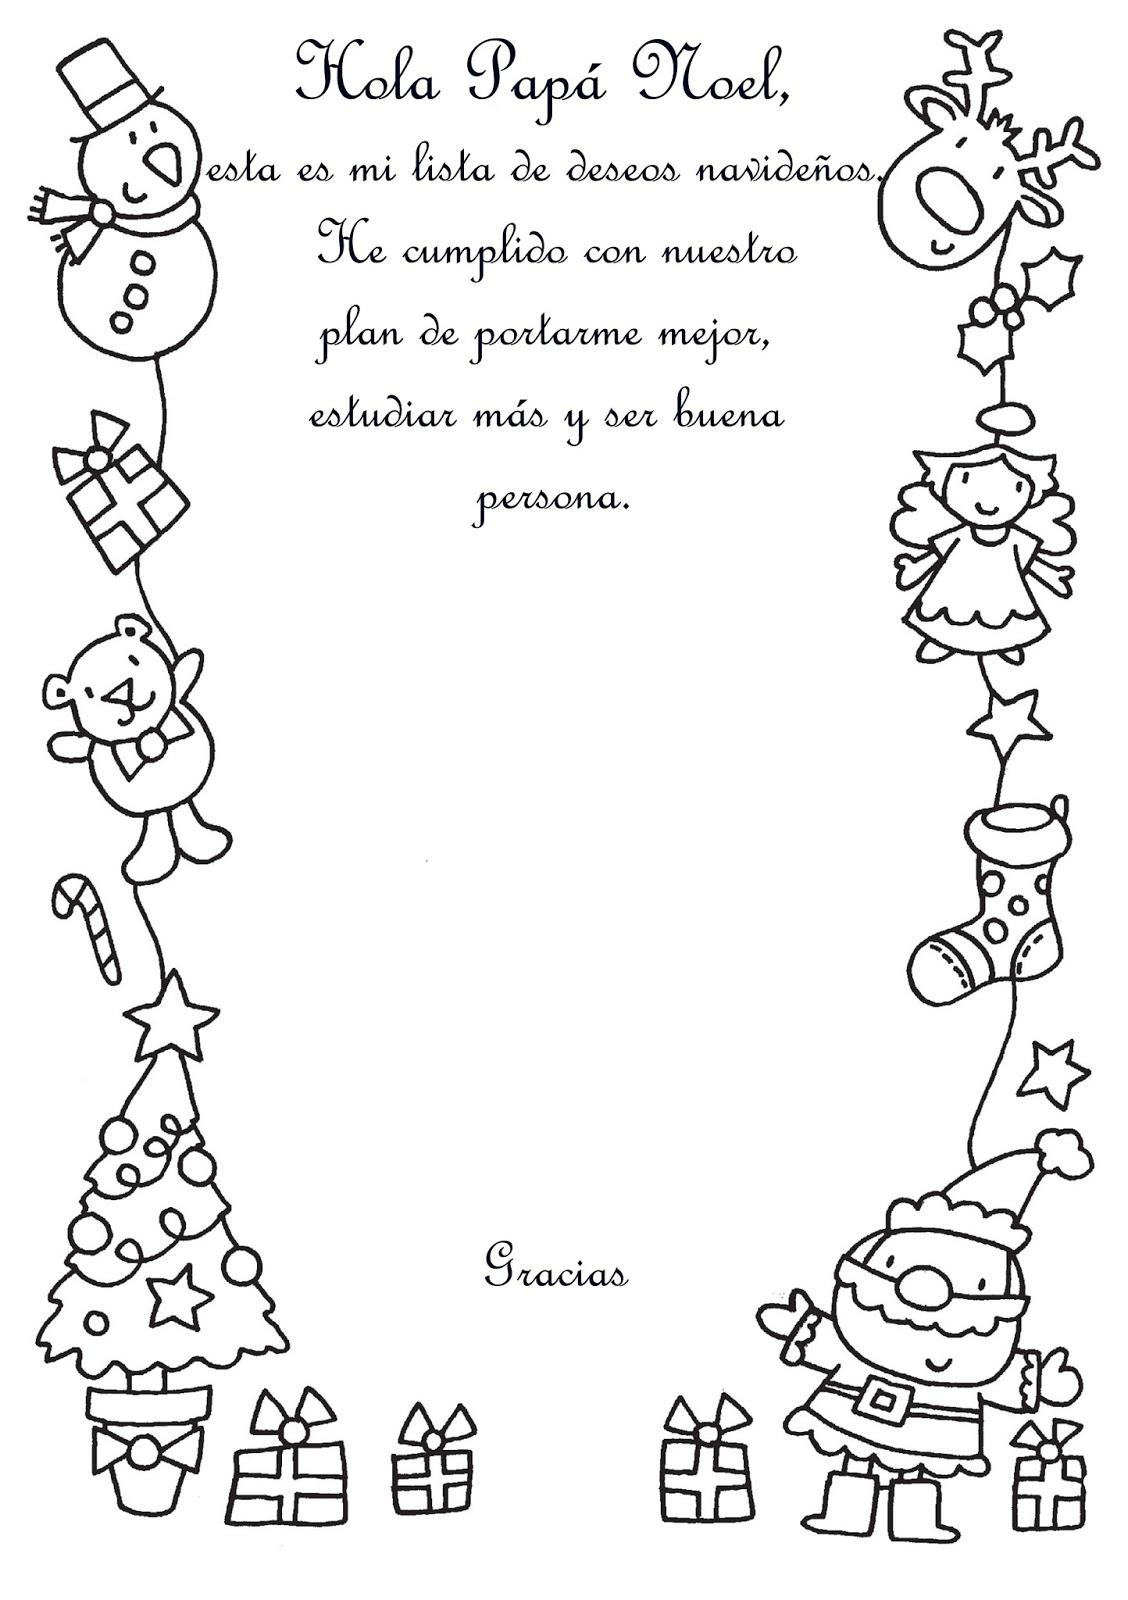 LAS IDEAS DE RODI: Carta para Papá Noel- Letter to Santa Claus